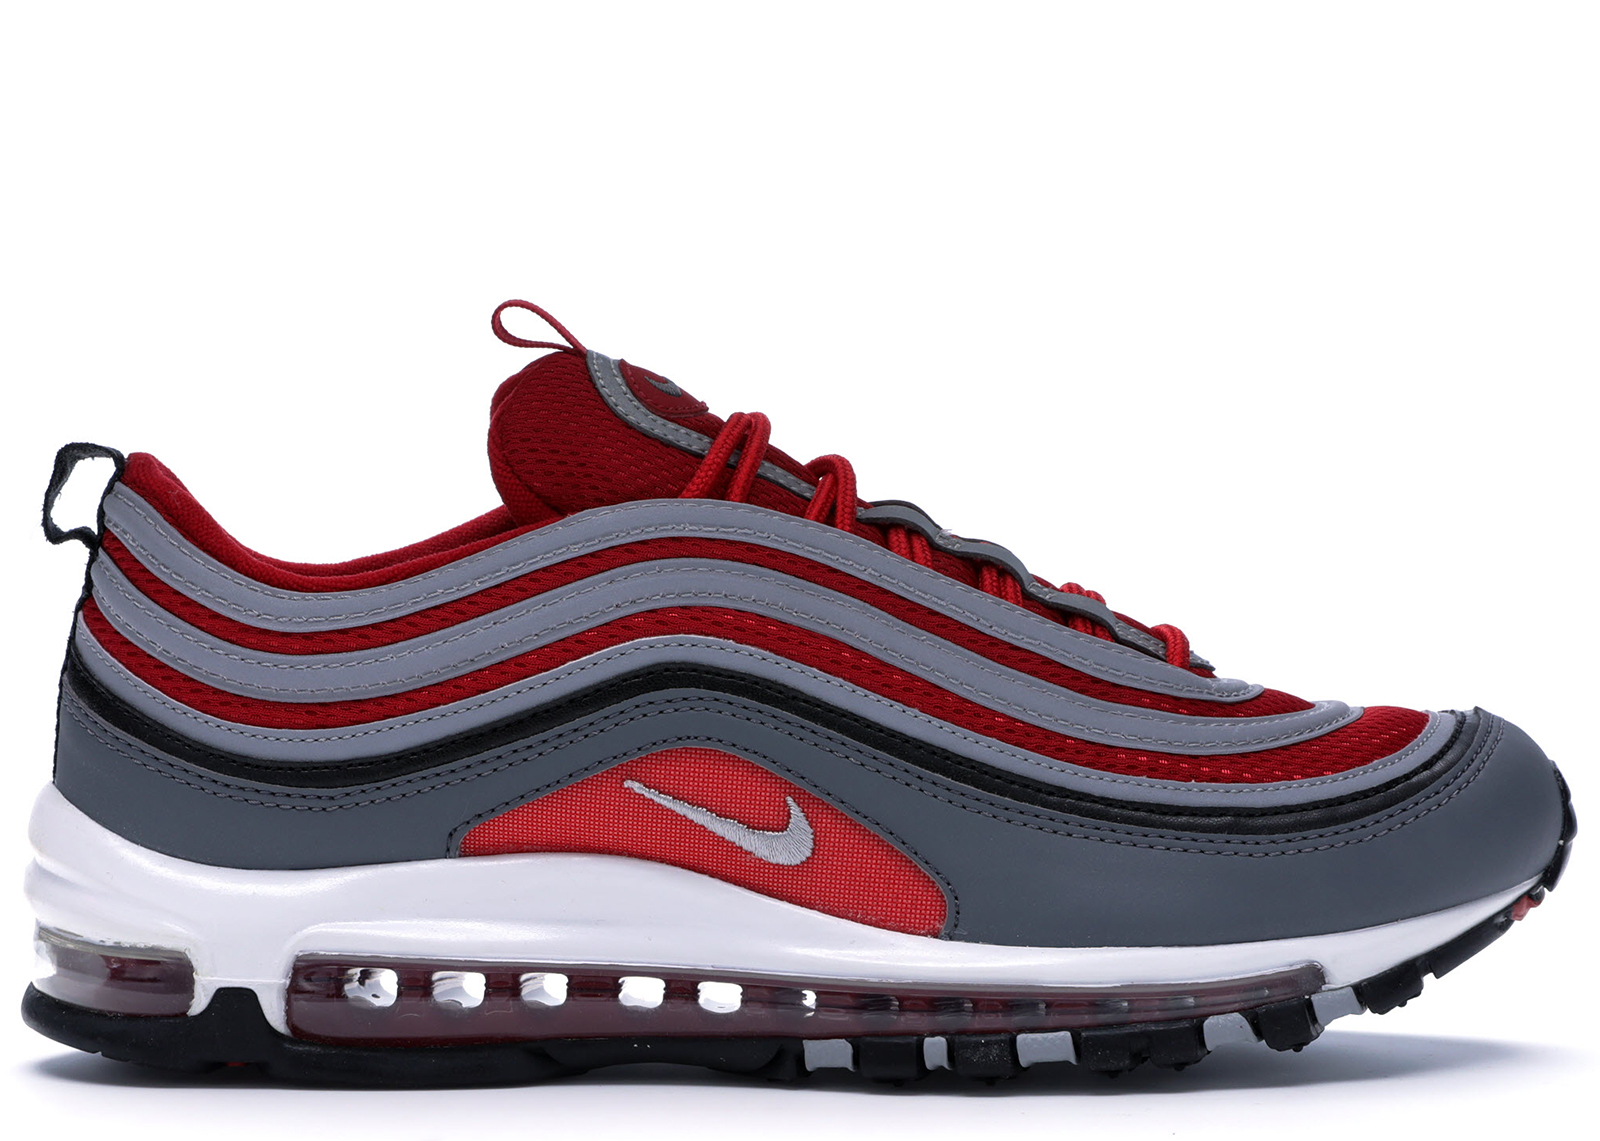 Nike Air Max 97 Dark Grey Gym Red - 921826-007